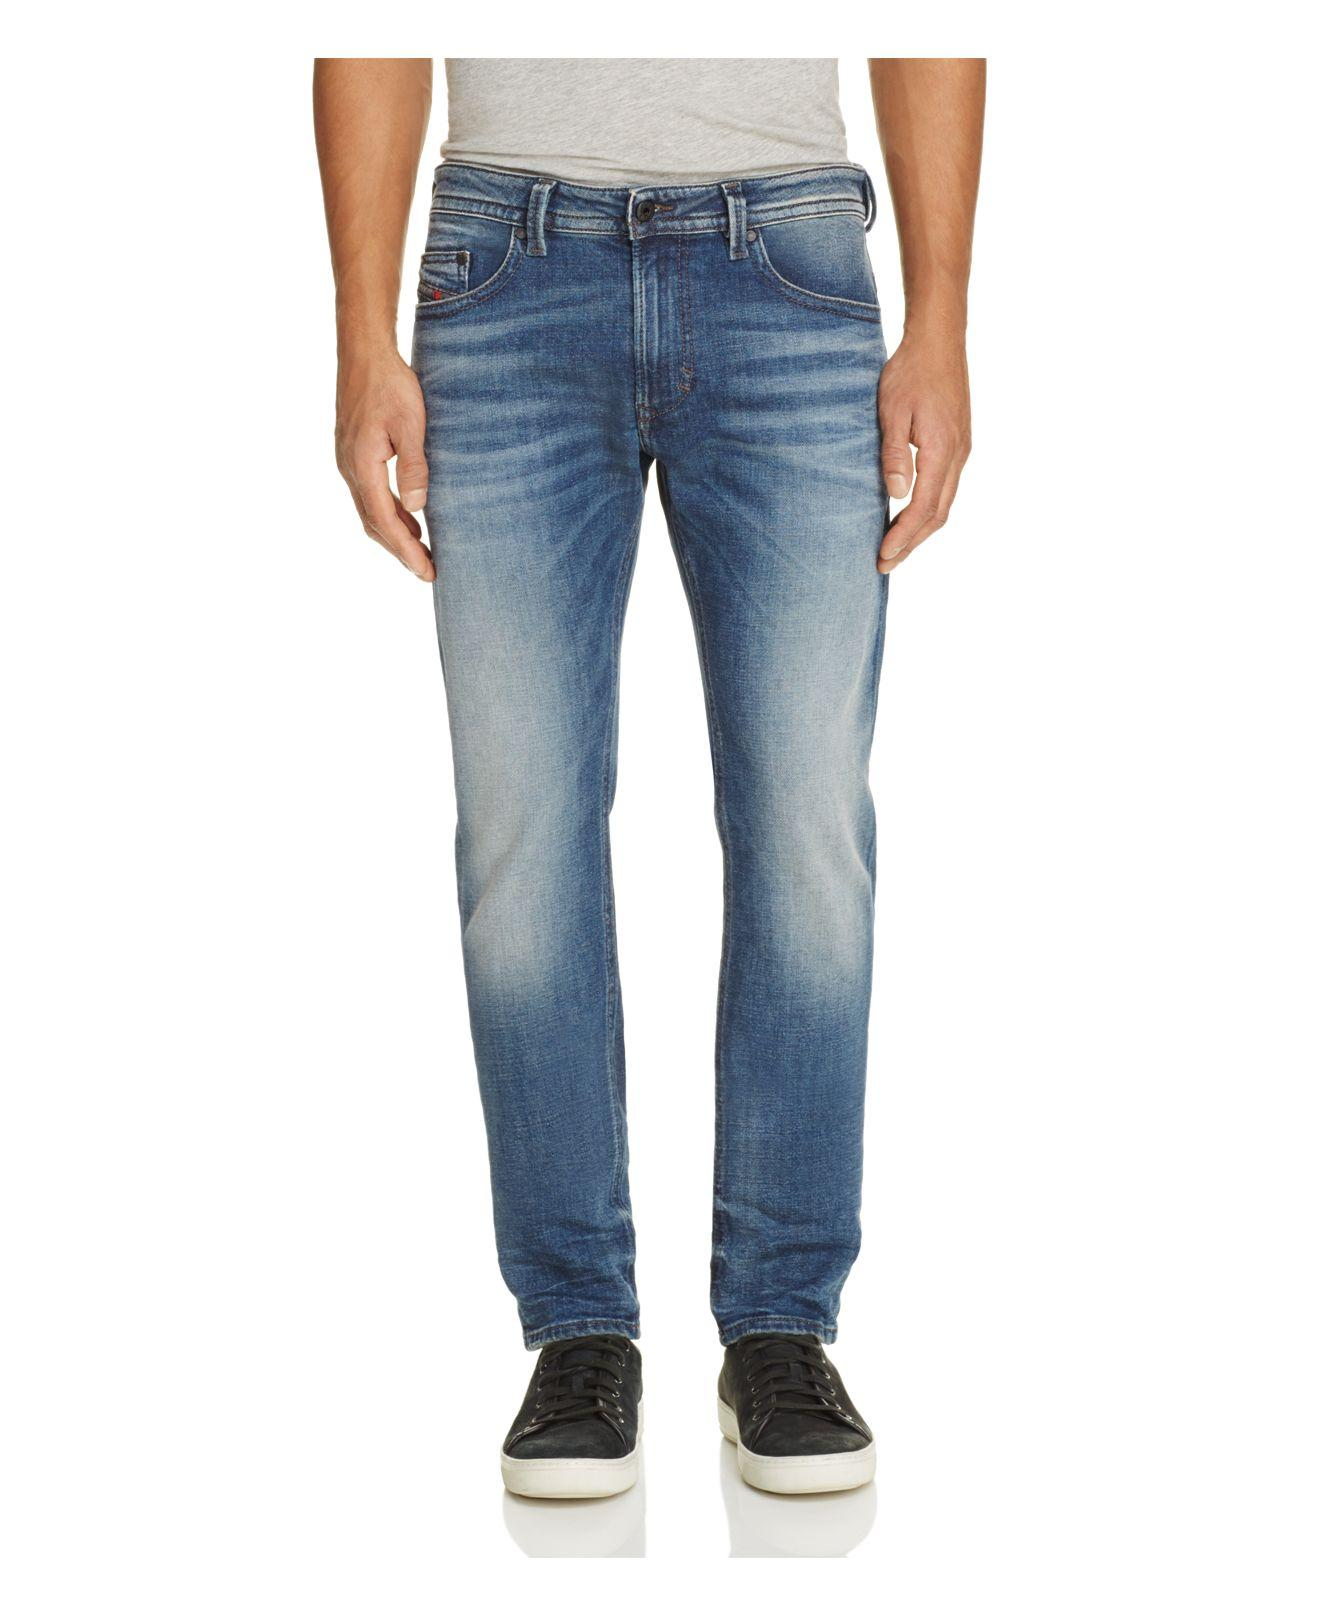 Lyst Diesel Thavar Super Slim Fit Jeans In Denim In Blue